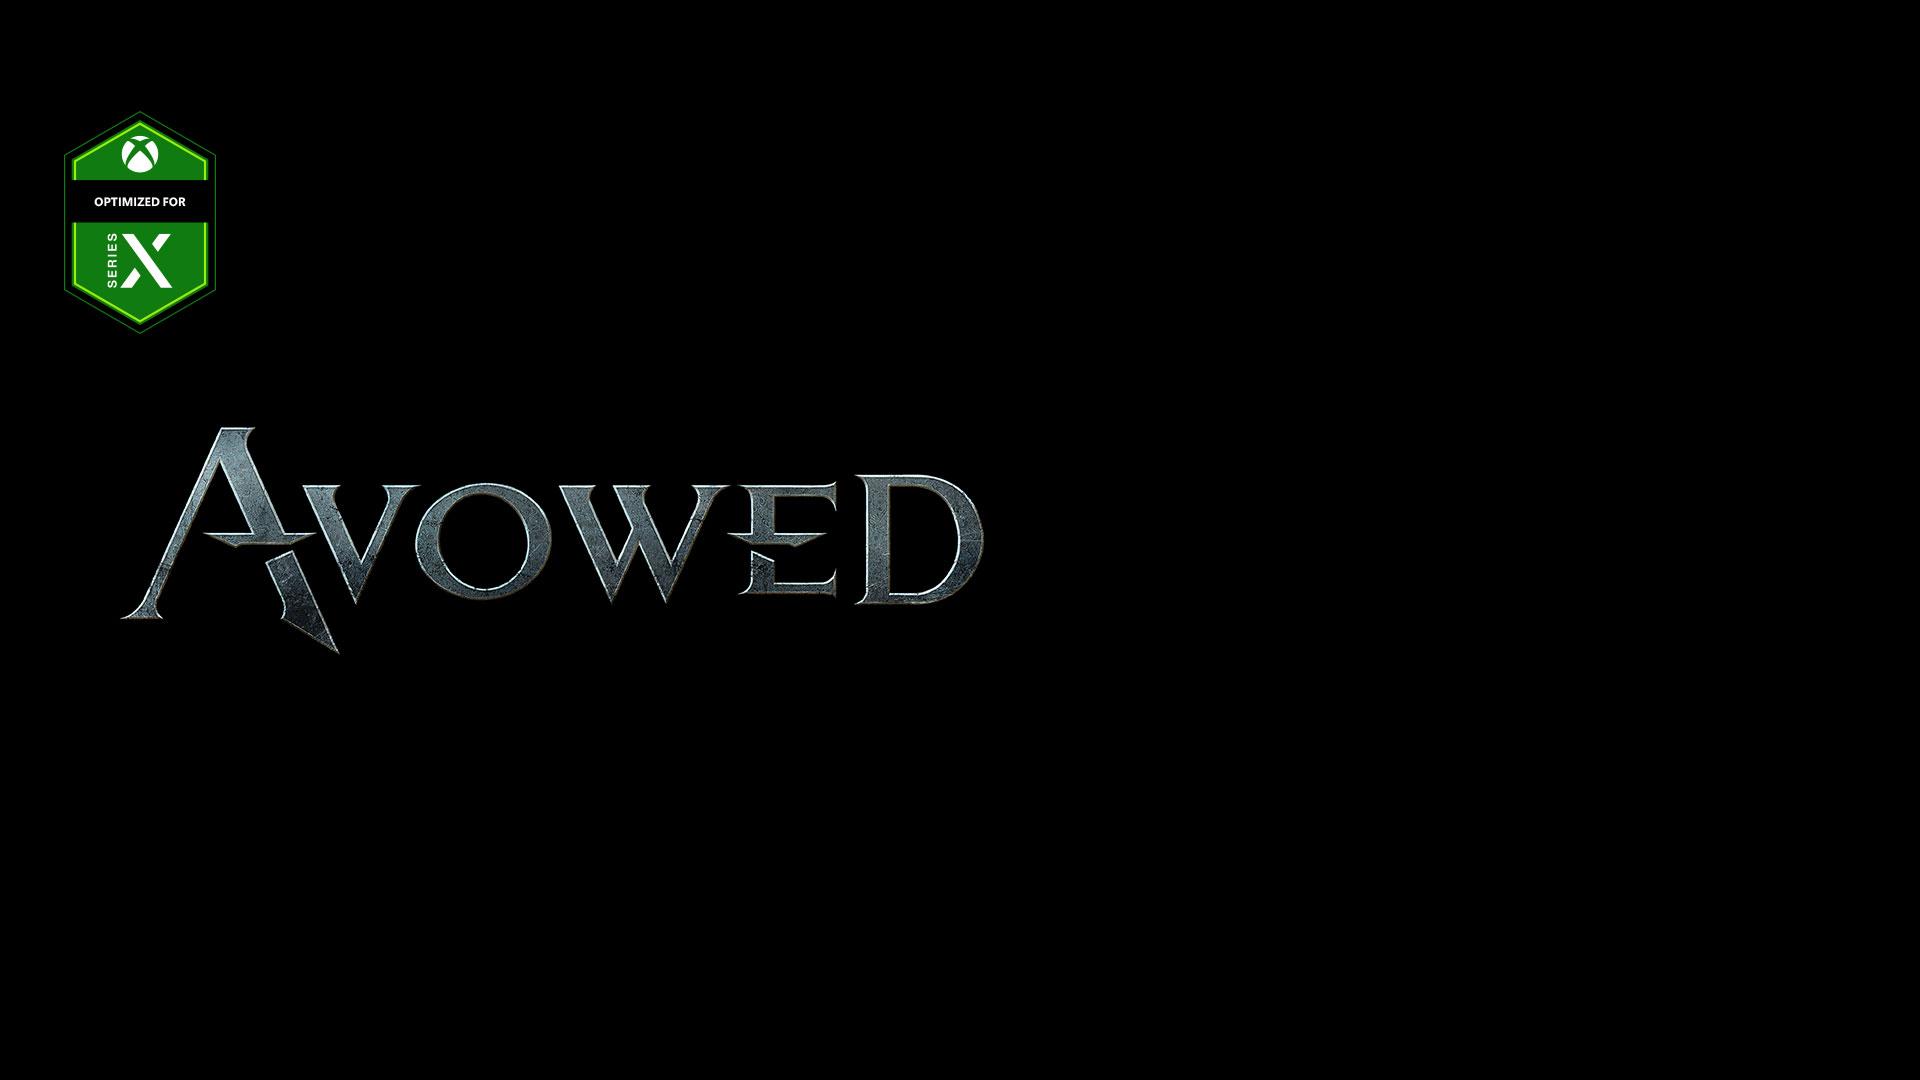 Avowed logo